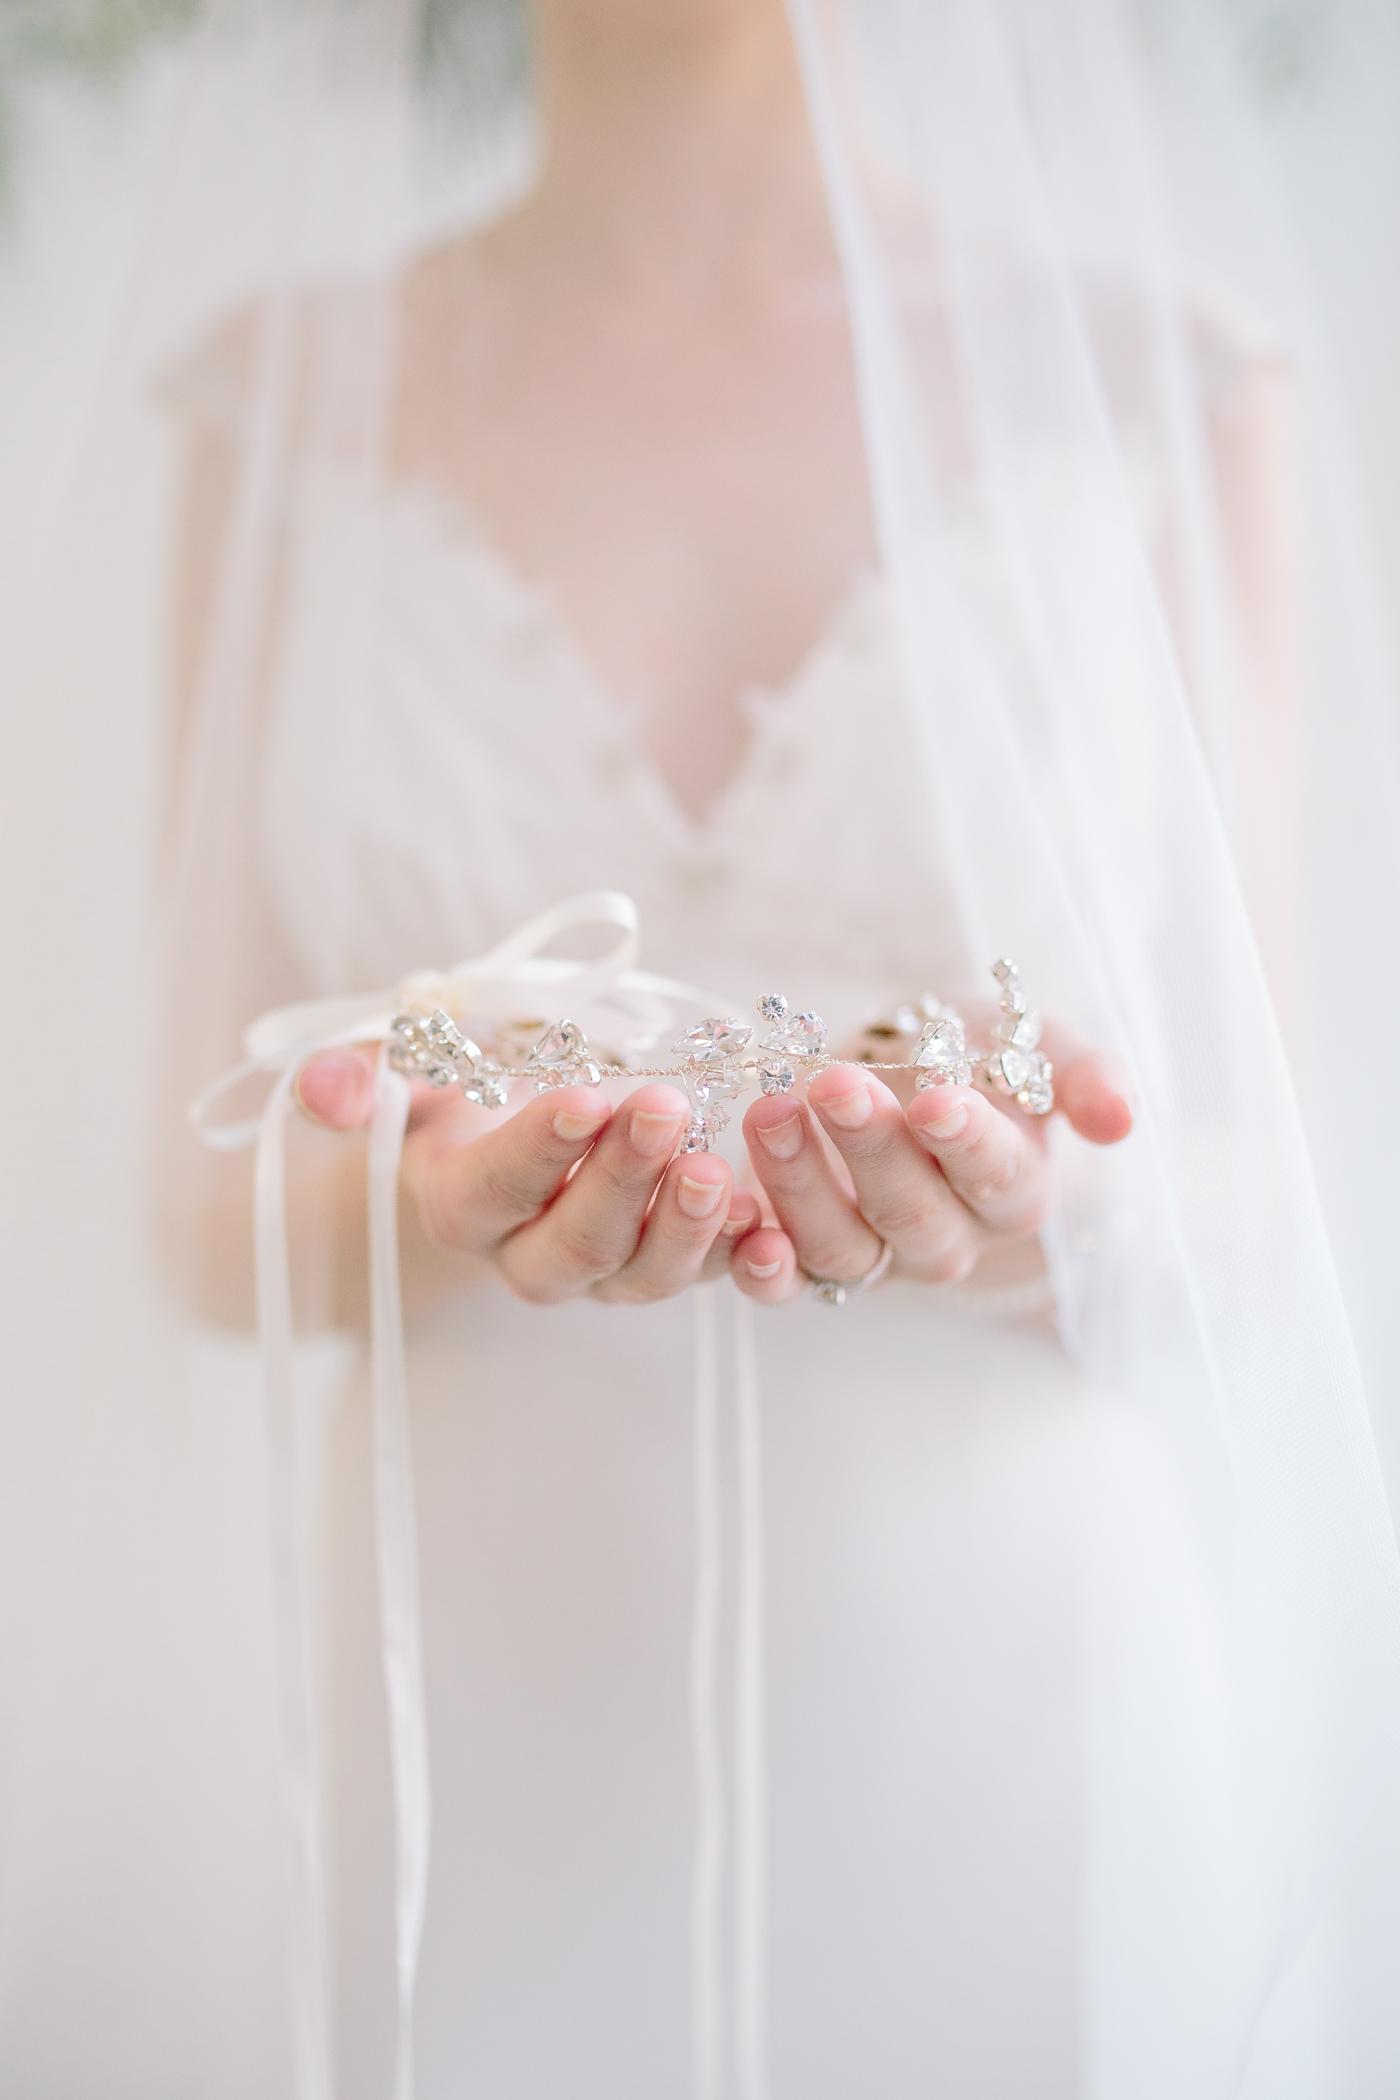 suzanne_li_photography_susan_dick_bridal_accessories-7.jpg